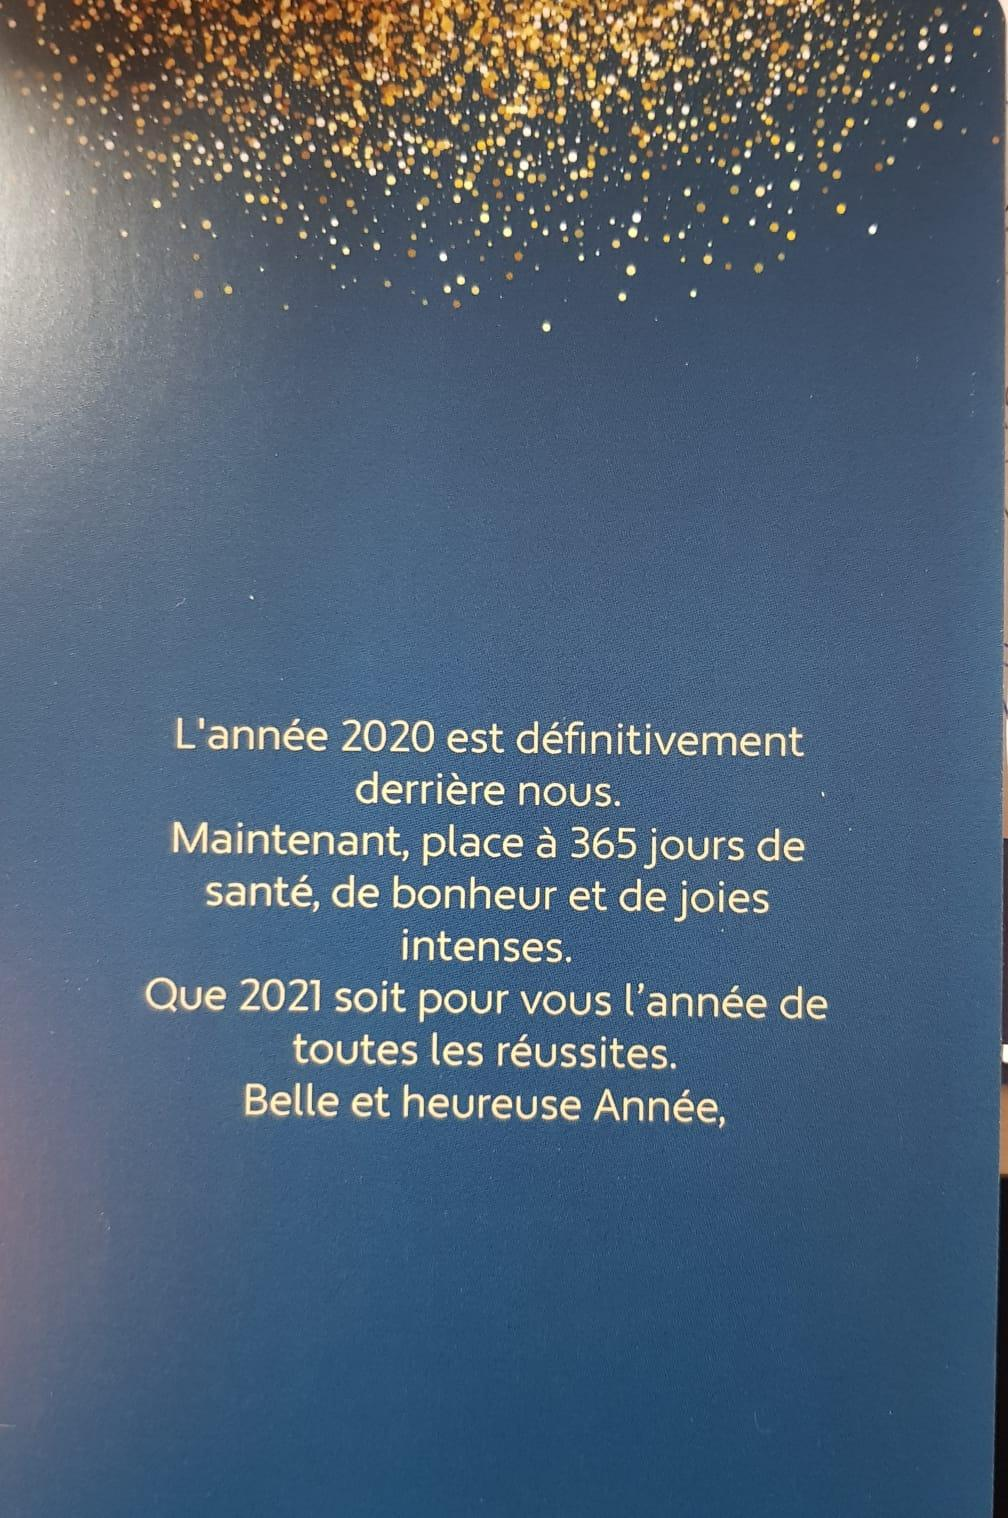 Meilleurs vœux 2021 2